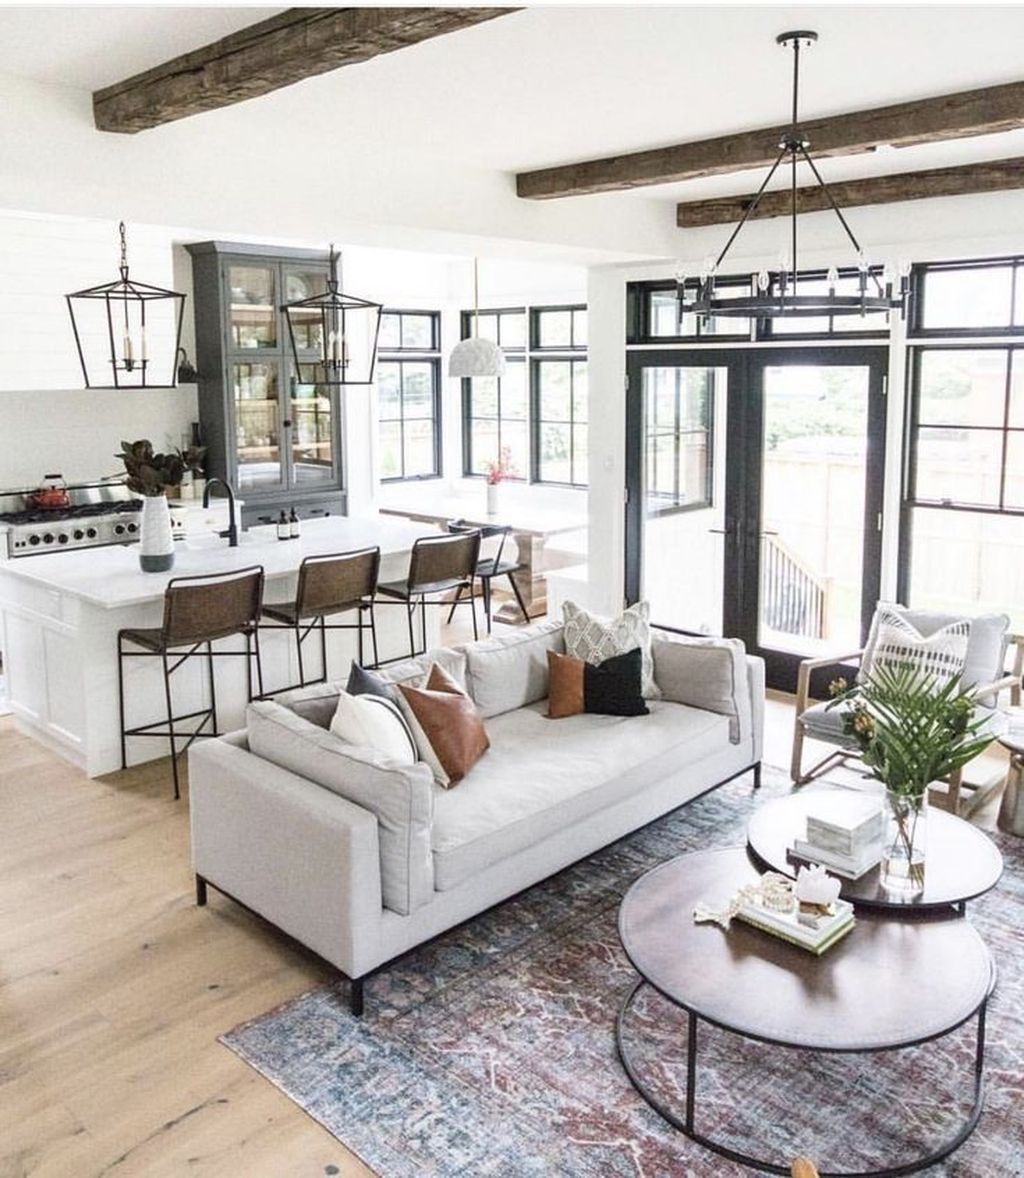 44 Inspiring Modern Open Living Room Design Ideas Trendehouse In 2020 Open Living Room Design Modern Minimalist Living Room Farm House Living Room